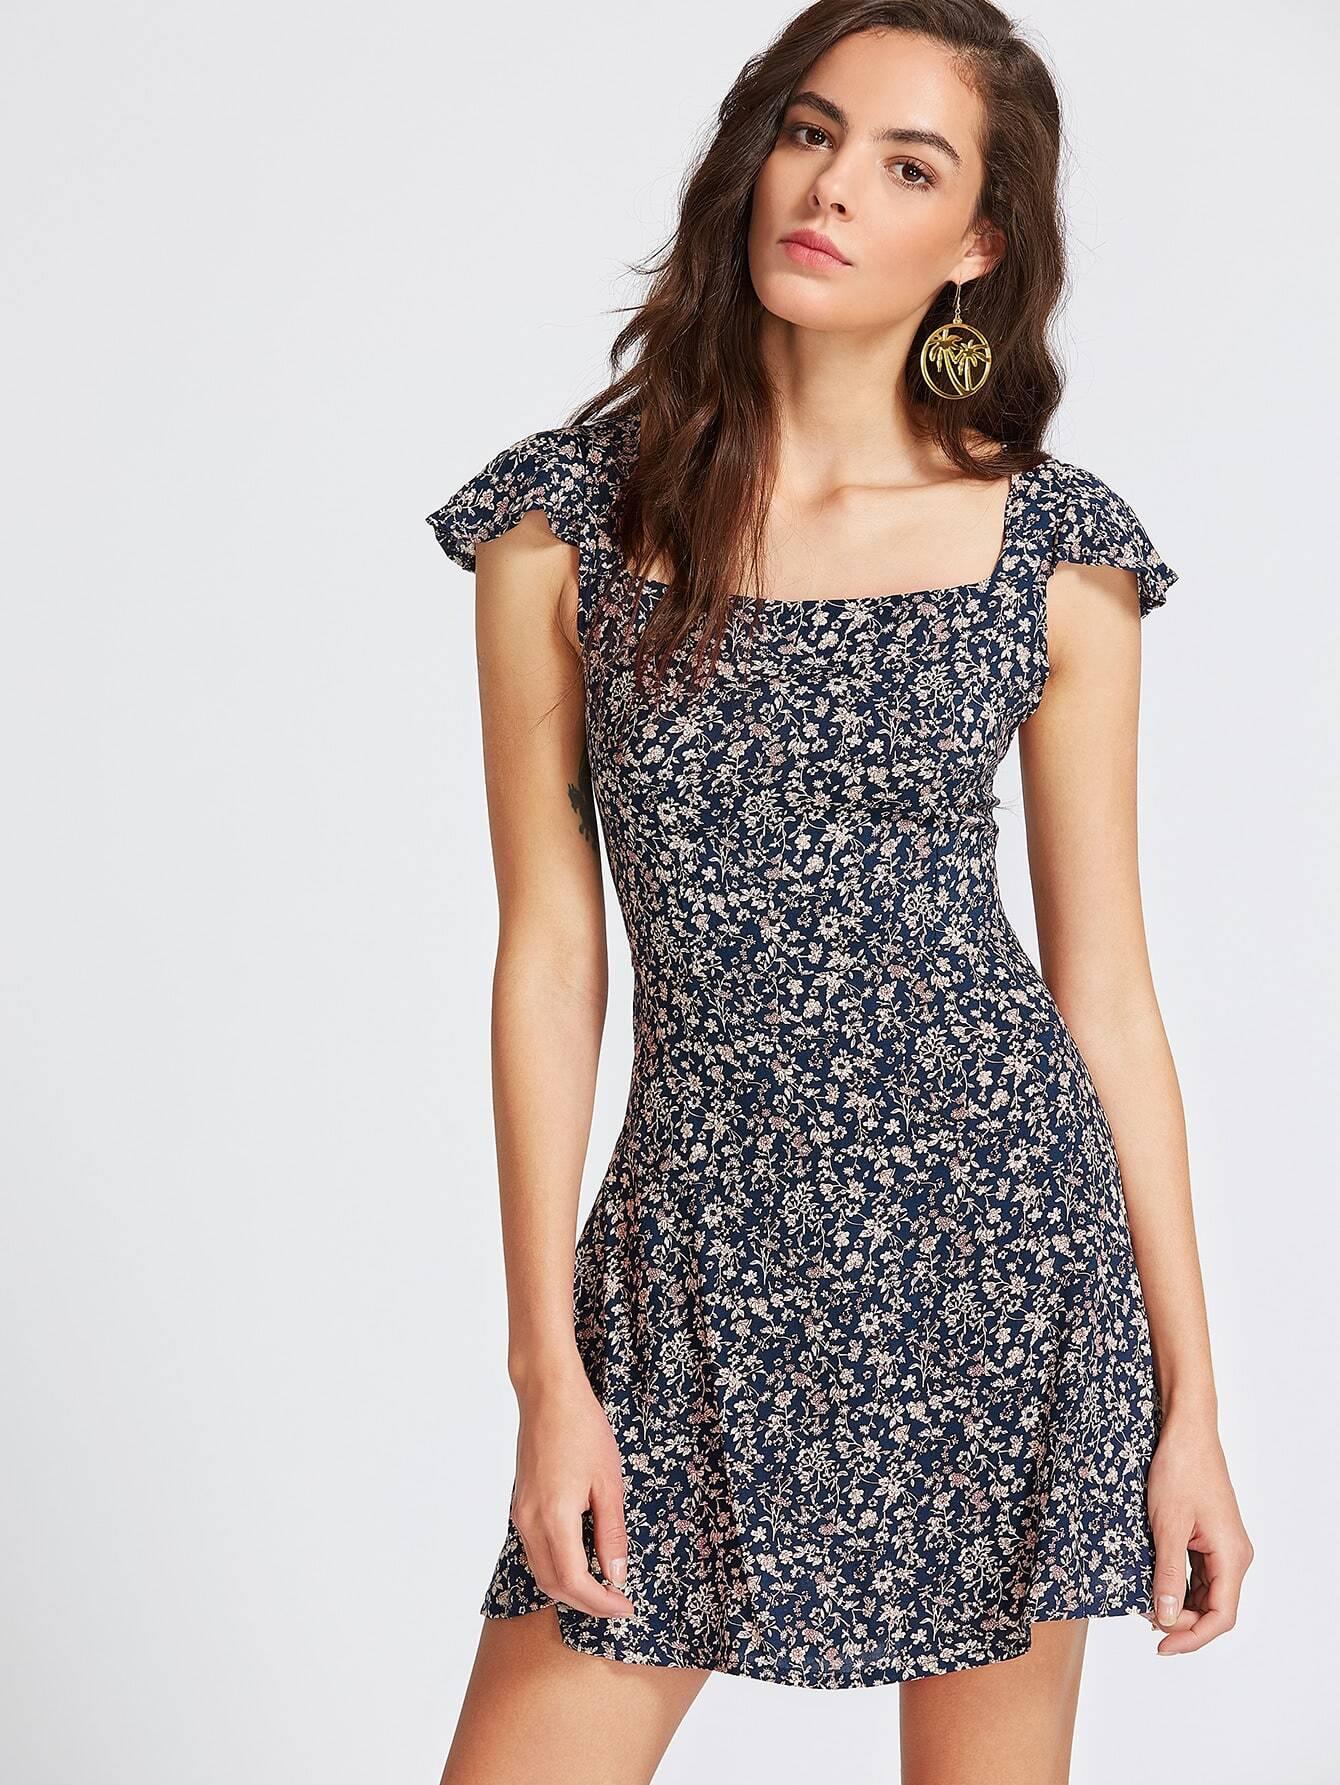 Фото Calico Print Square Neck Criss Cross Back Dress. Купить с доставкой